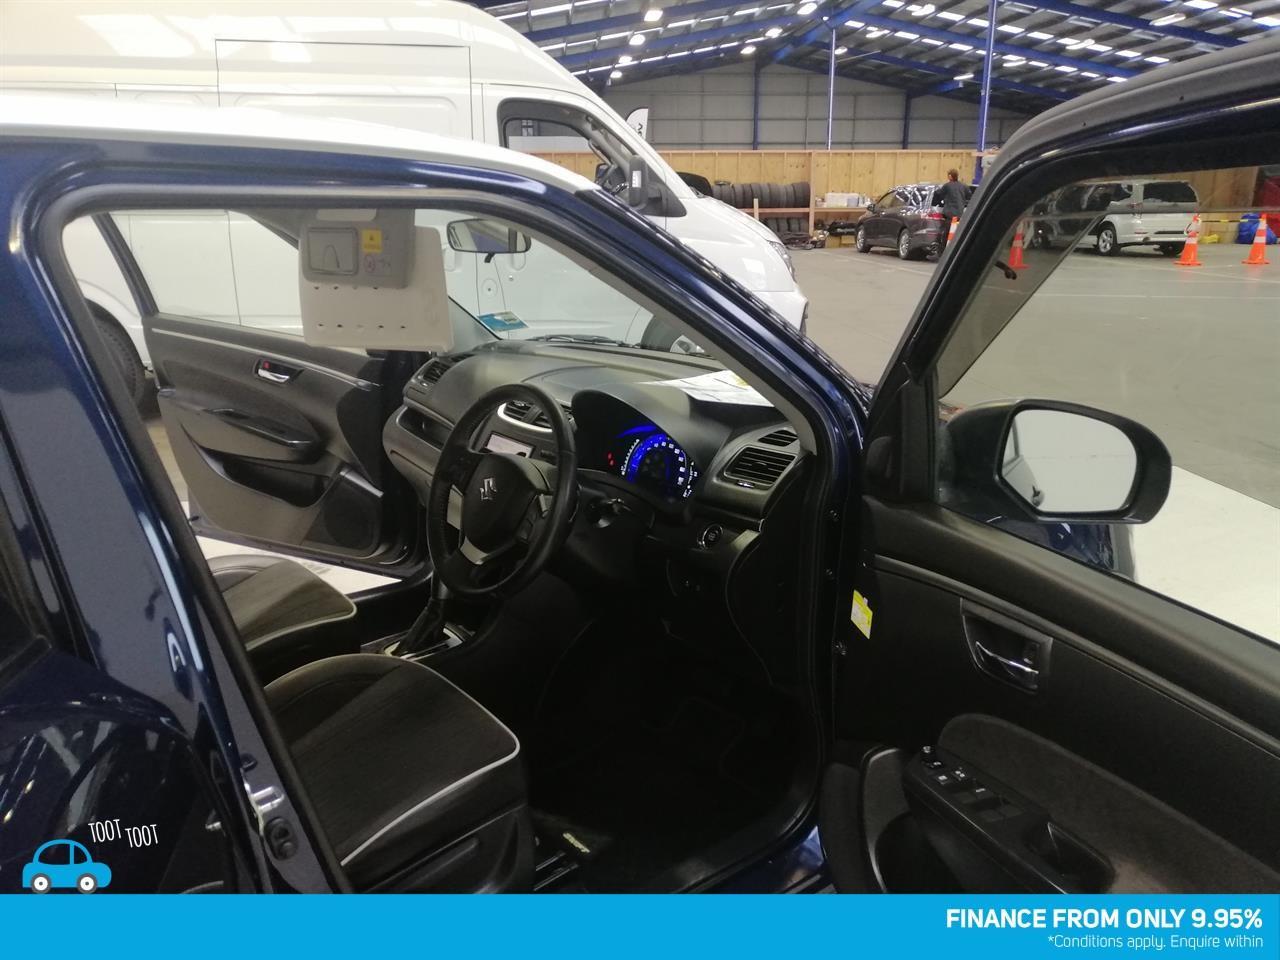 image-12, 2015 Suzuki SWIFT DJE Style Edition at Dunedin